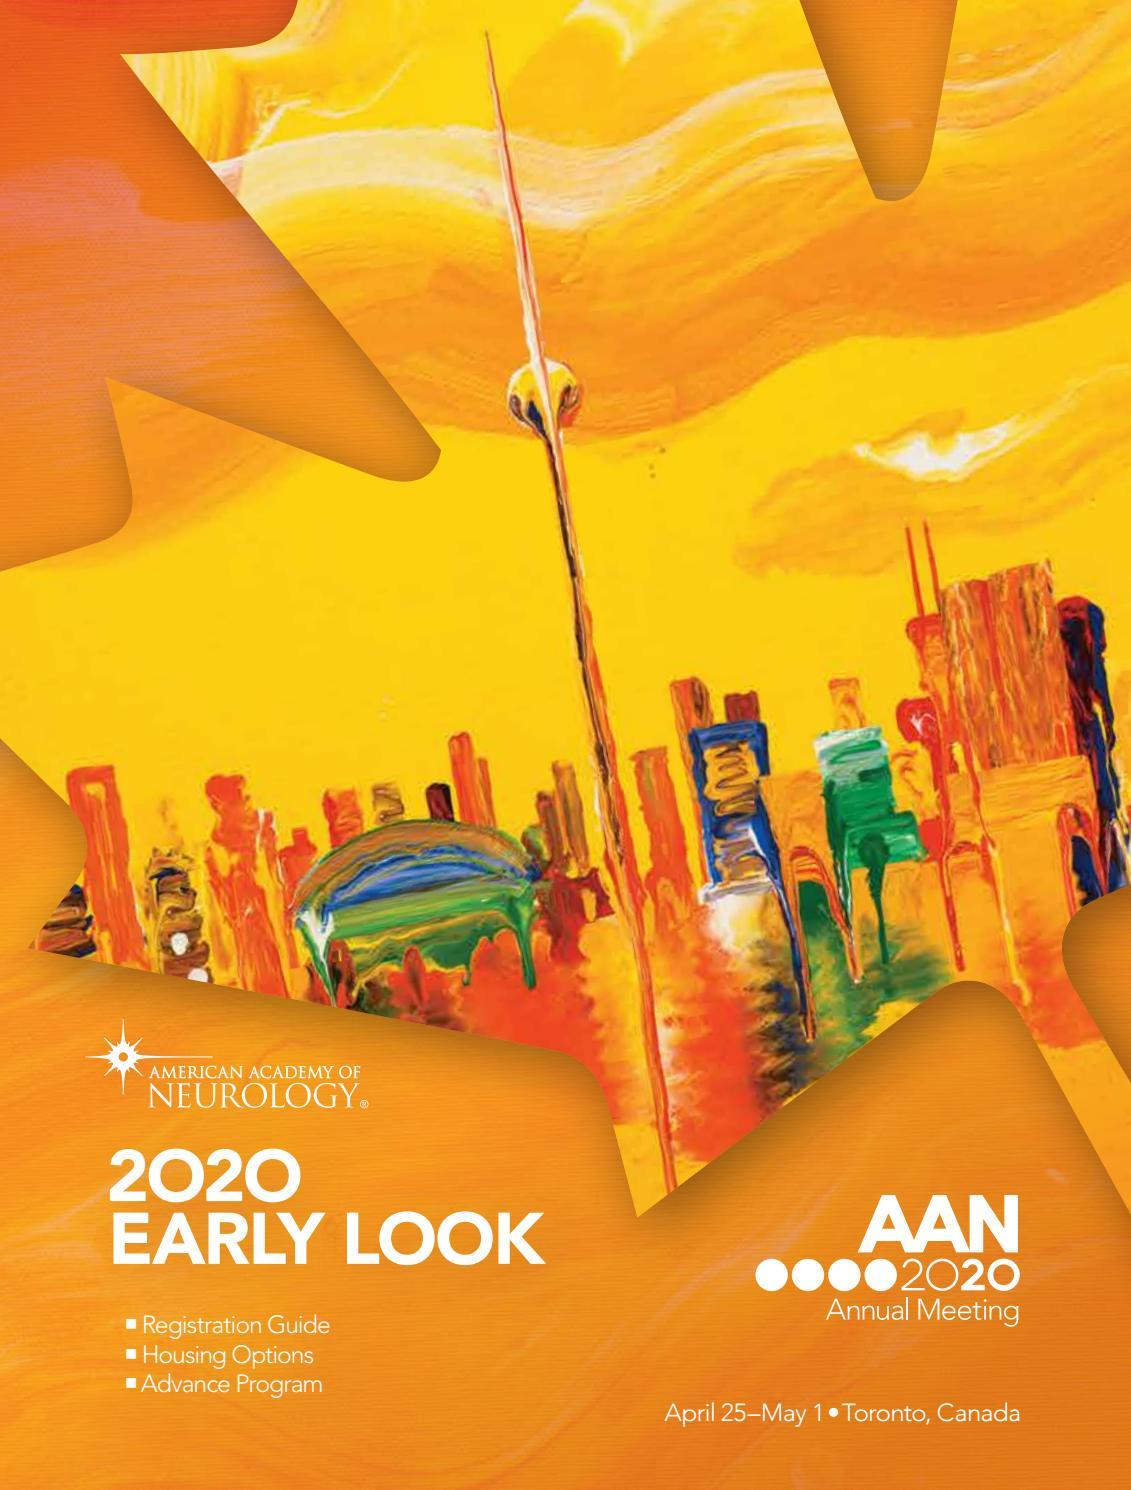 2020 Aan Annual Meeting Early Look By American Academy Of Neurology Issuu